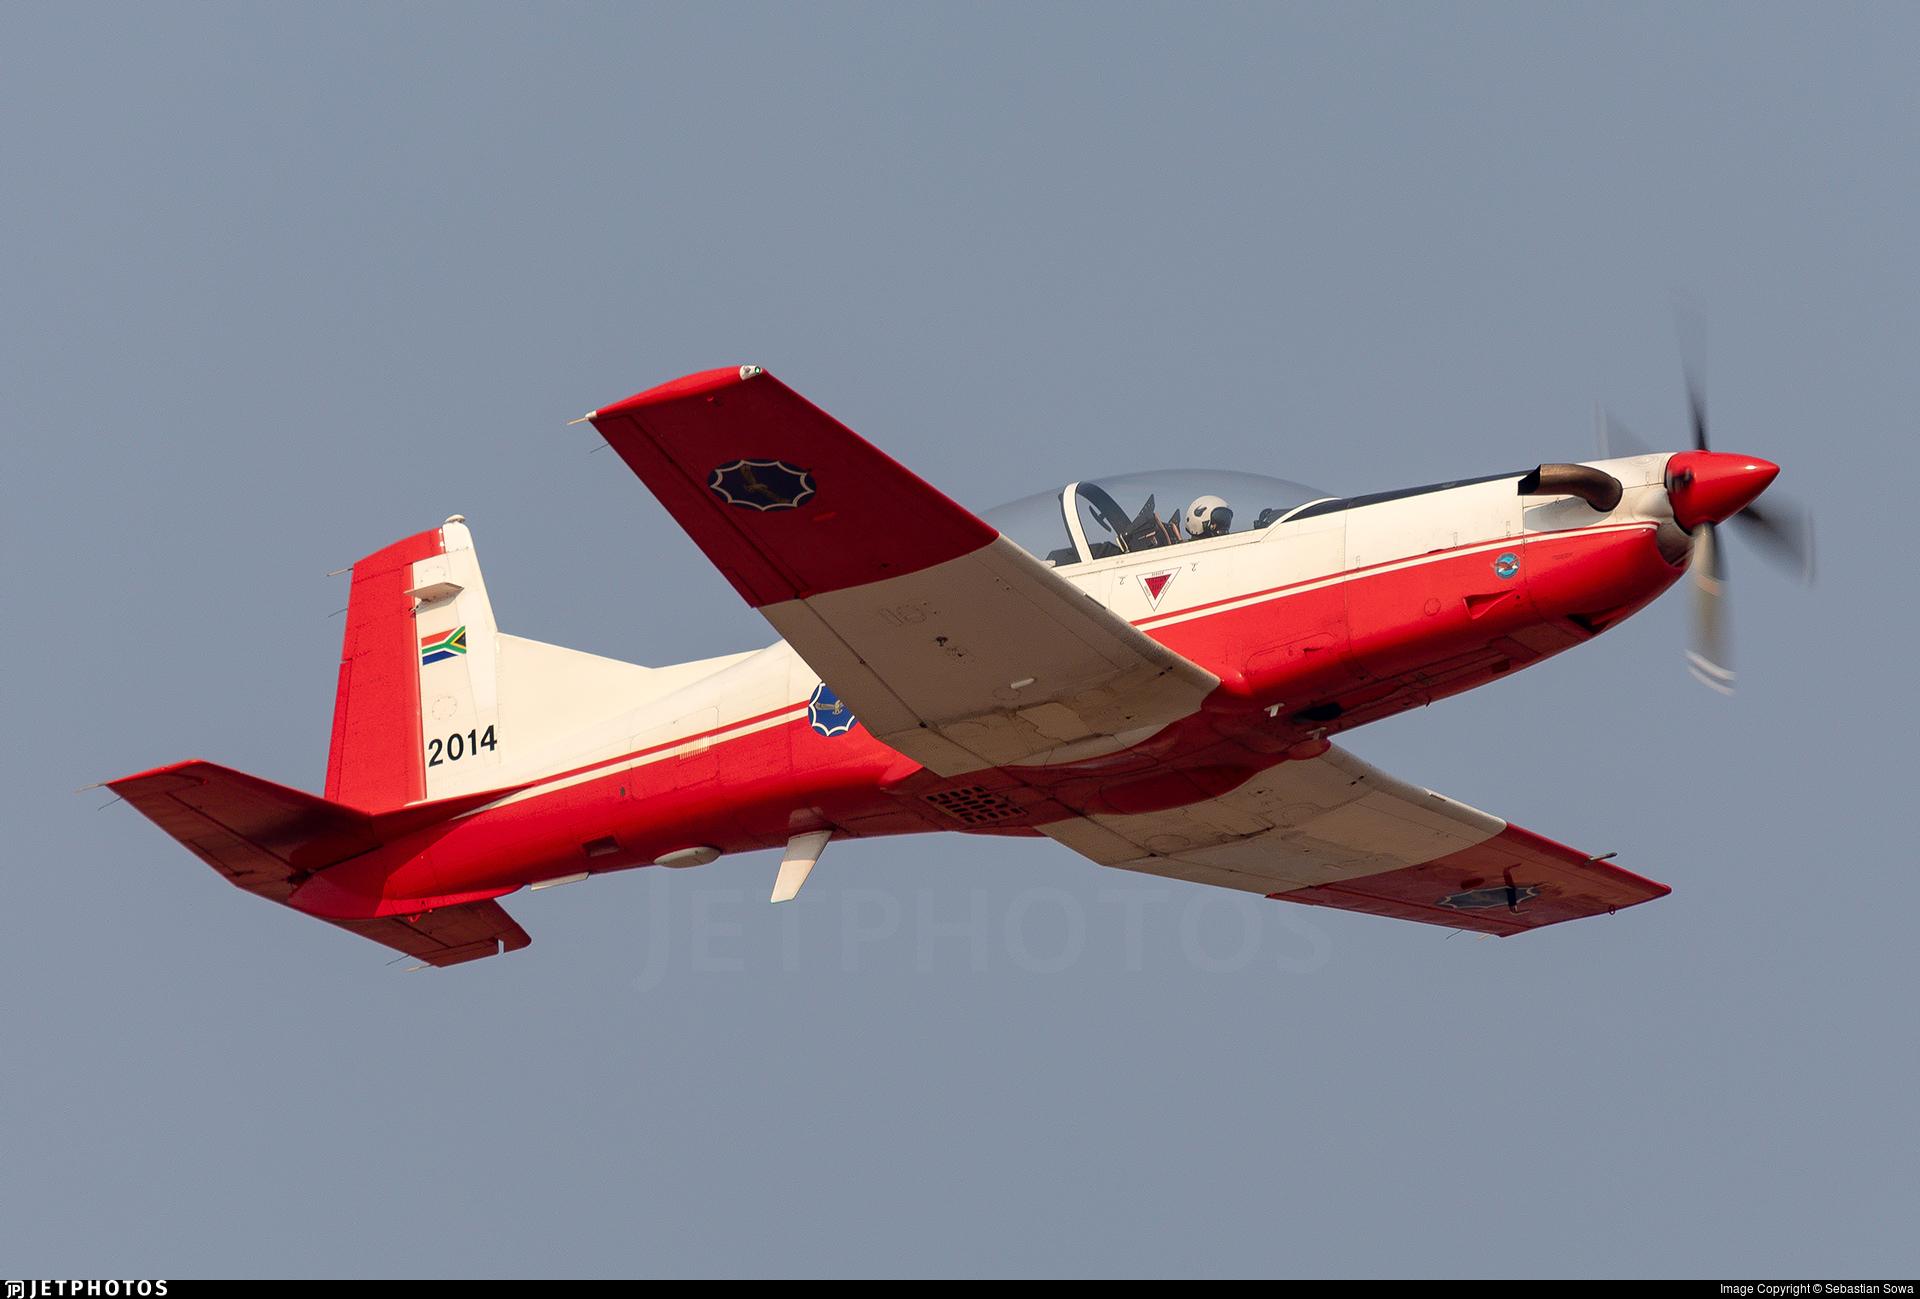 2014 - Pilatus PC-7 Mk.II - South Africa - Air Force